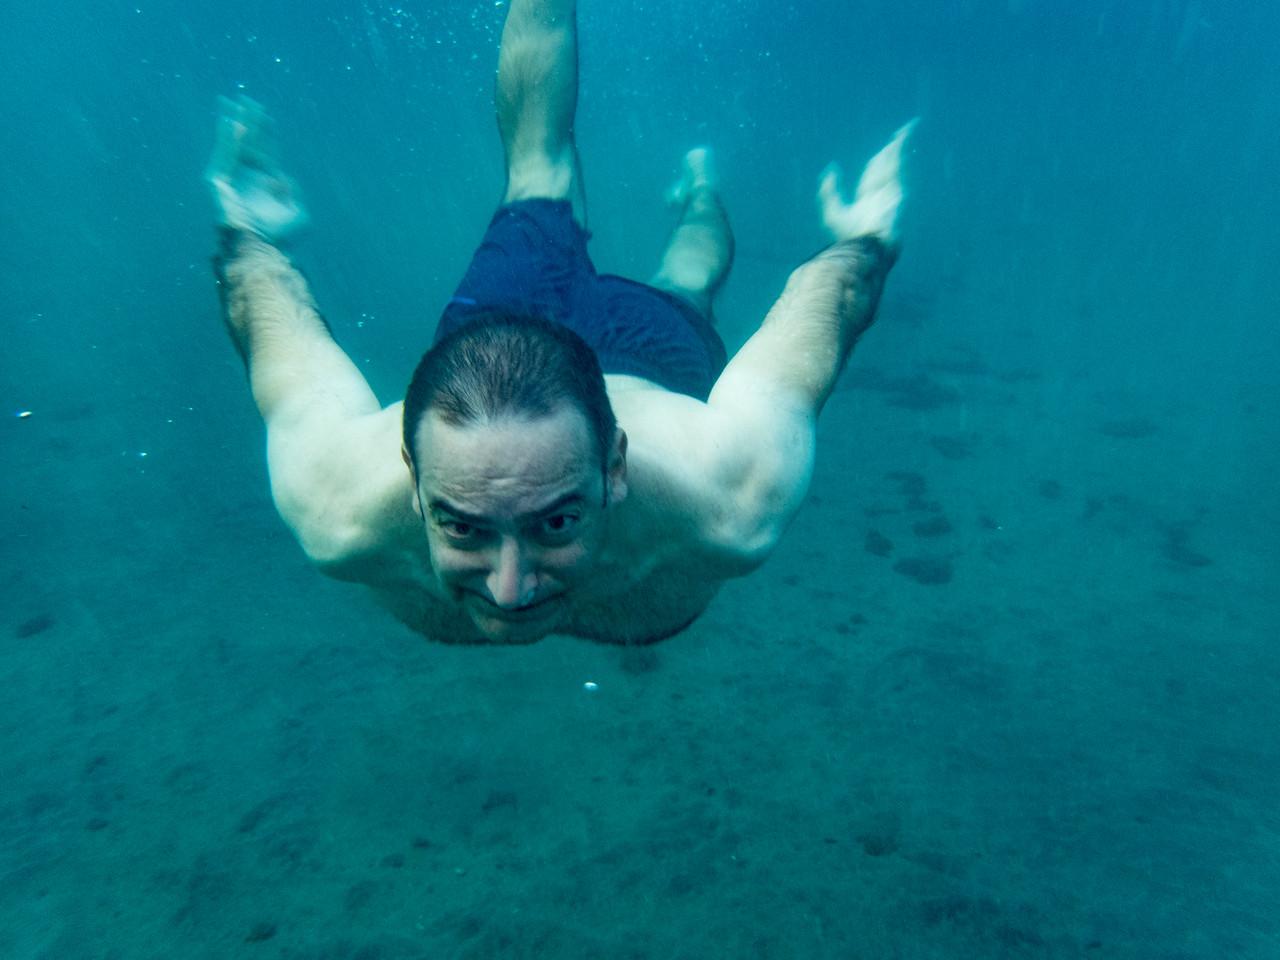 Rich swimming